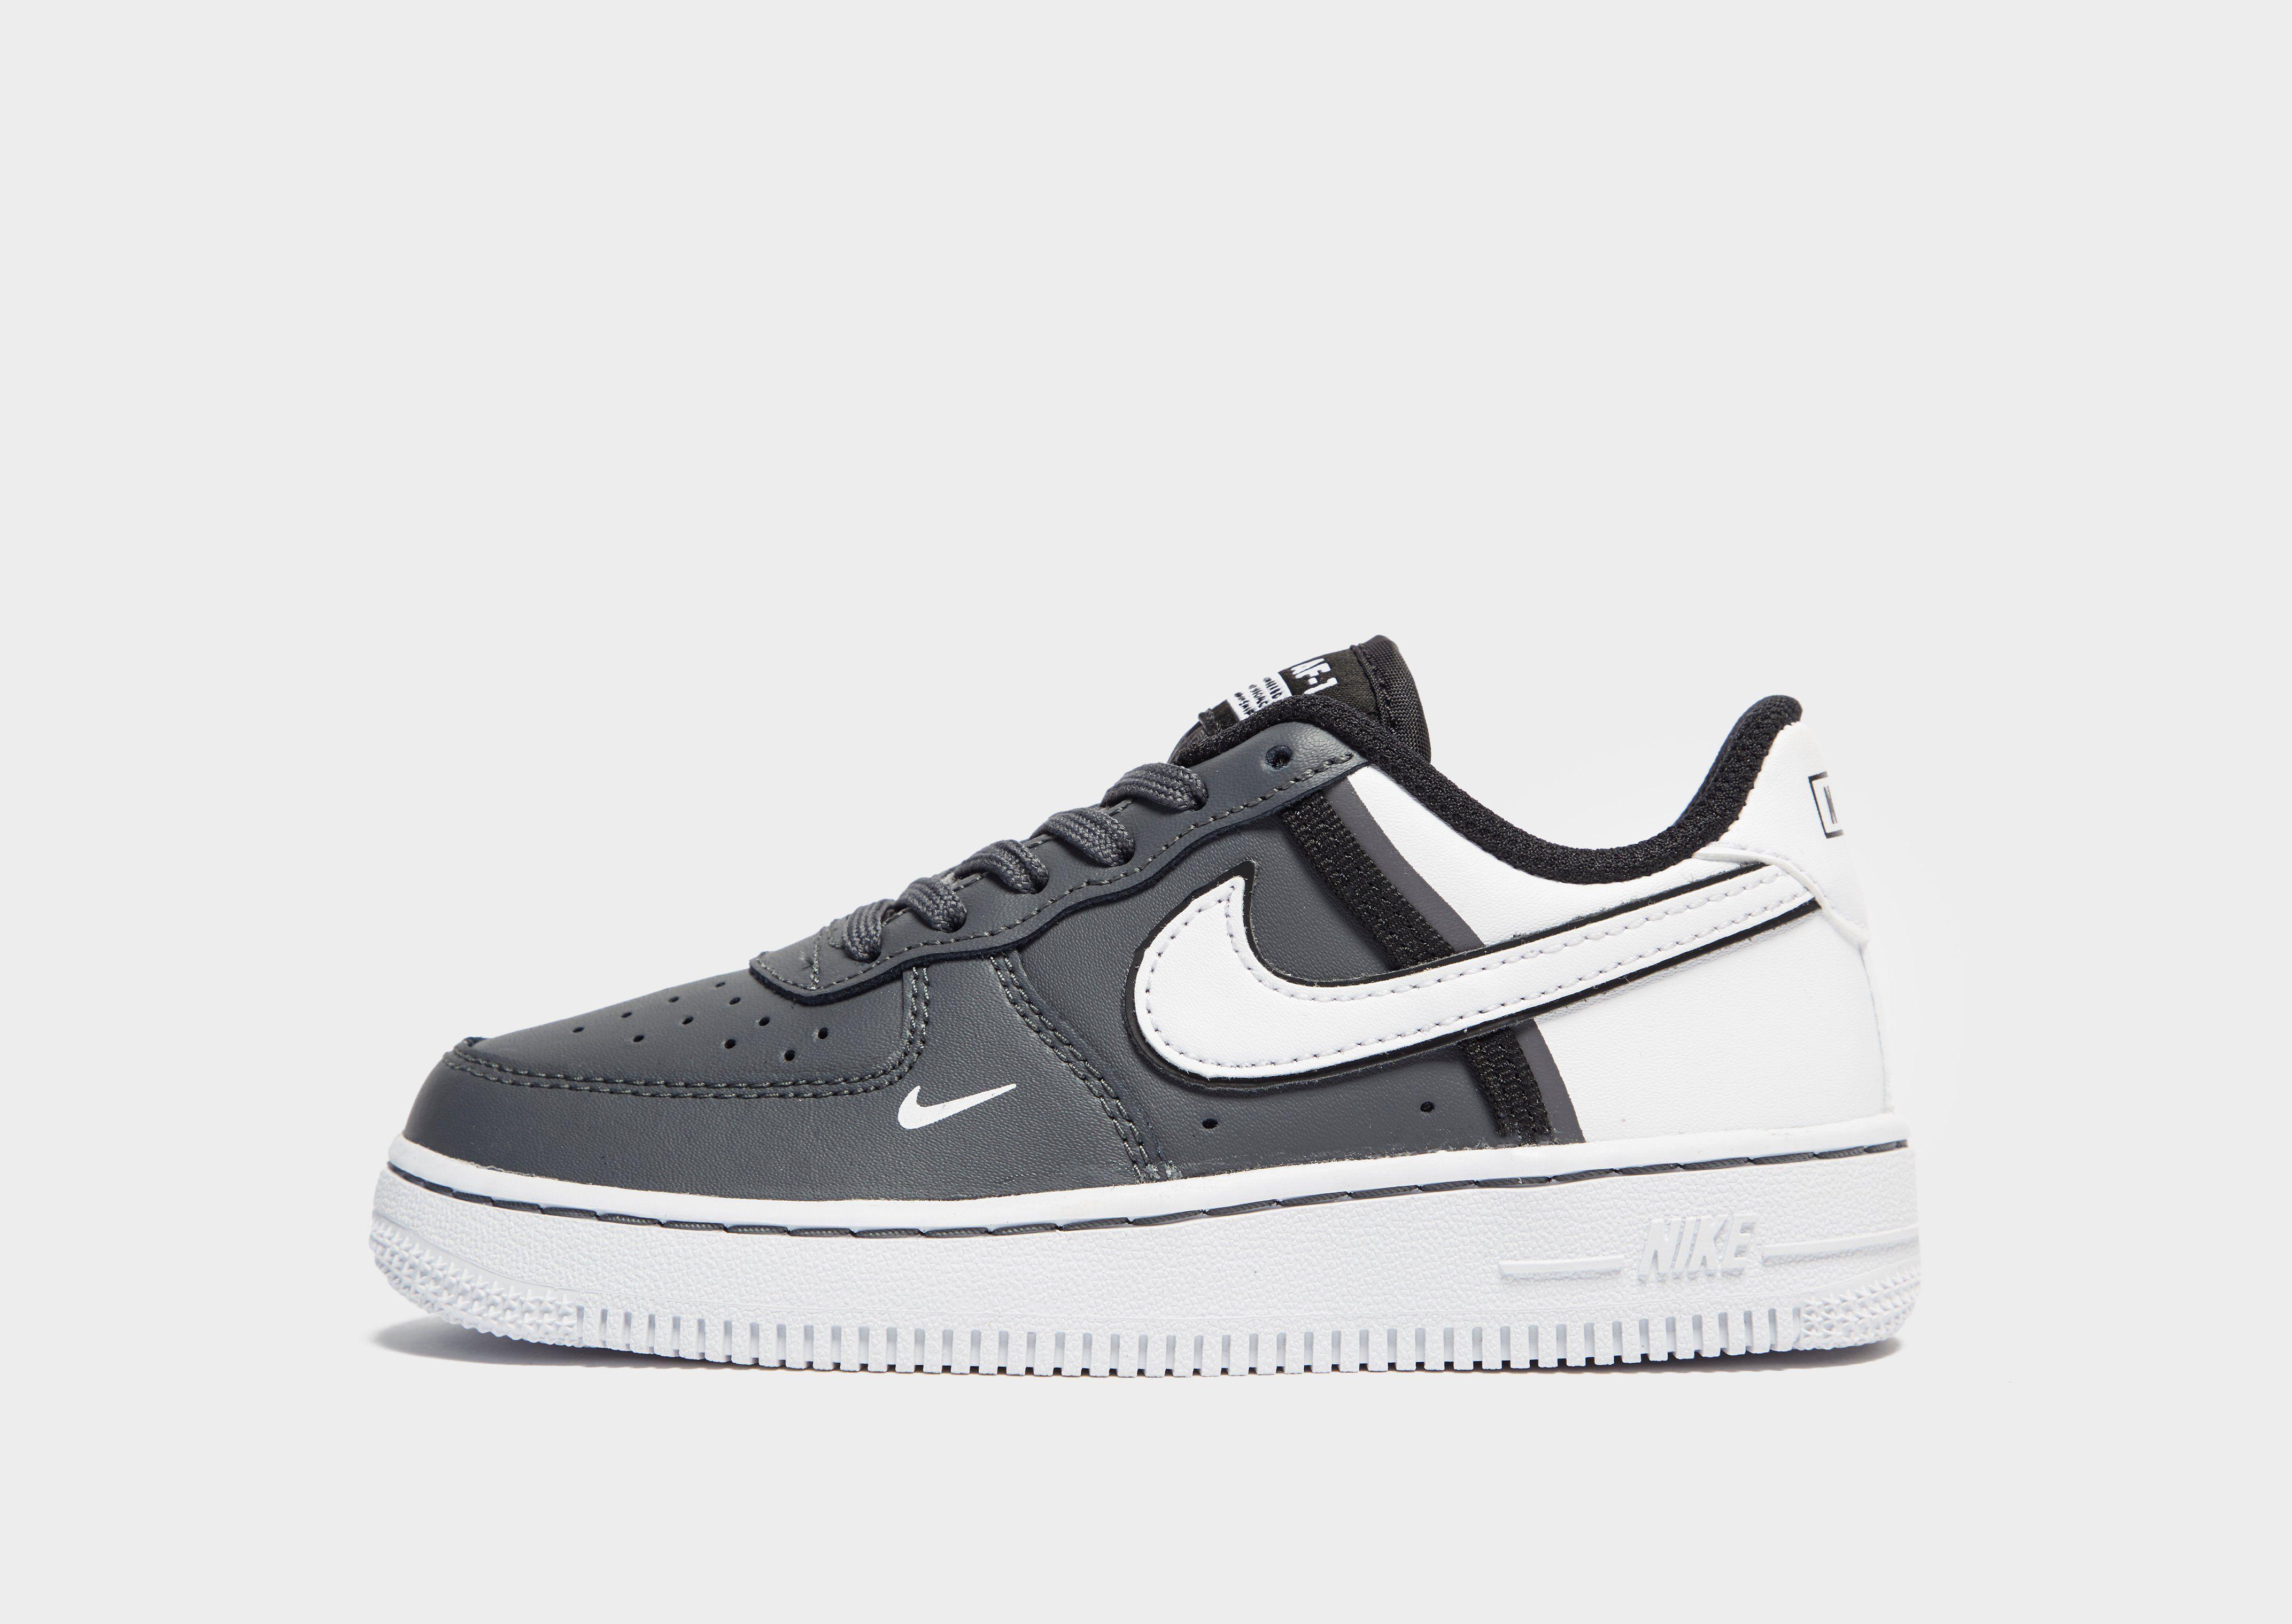 sélection premium c2637 71555 Nike Air Force 1 Low Children | JD Sports Ireland